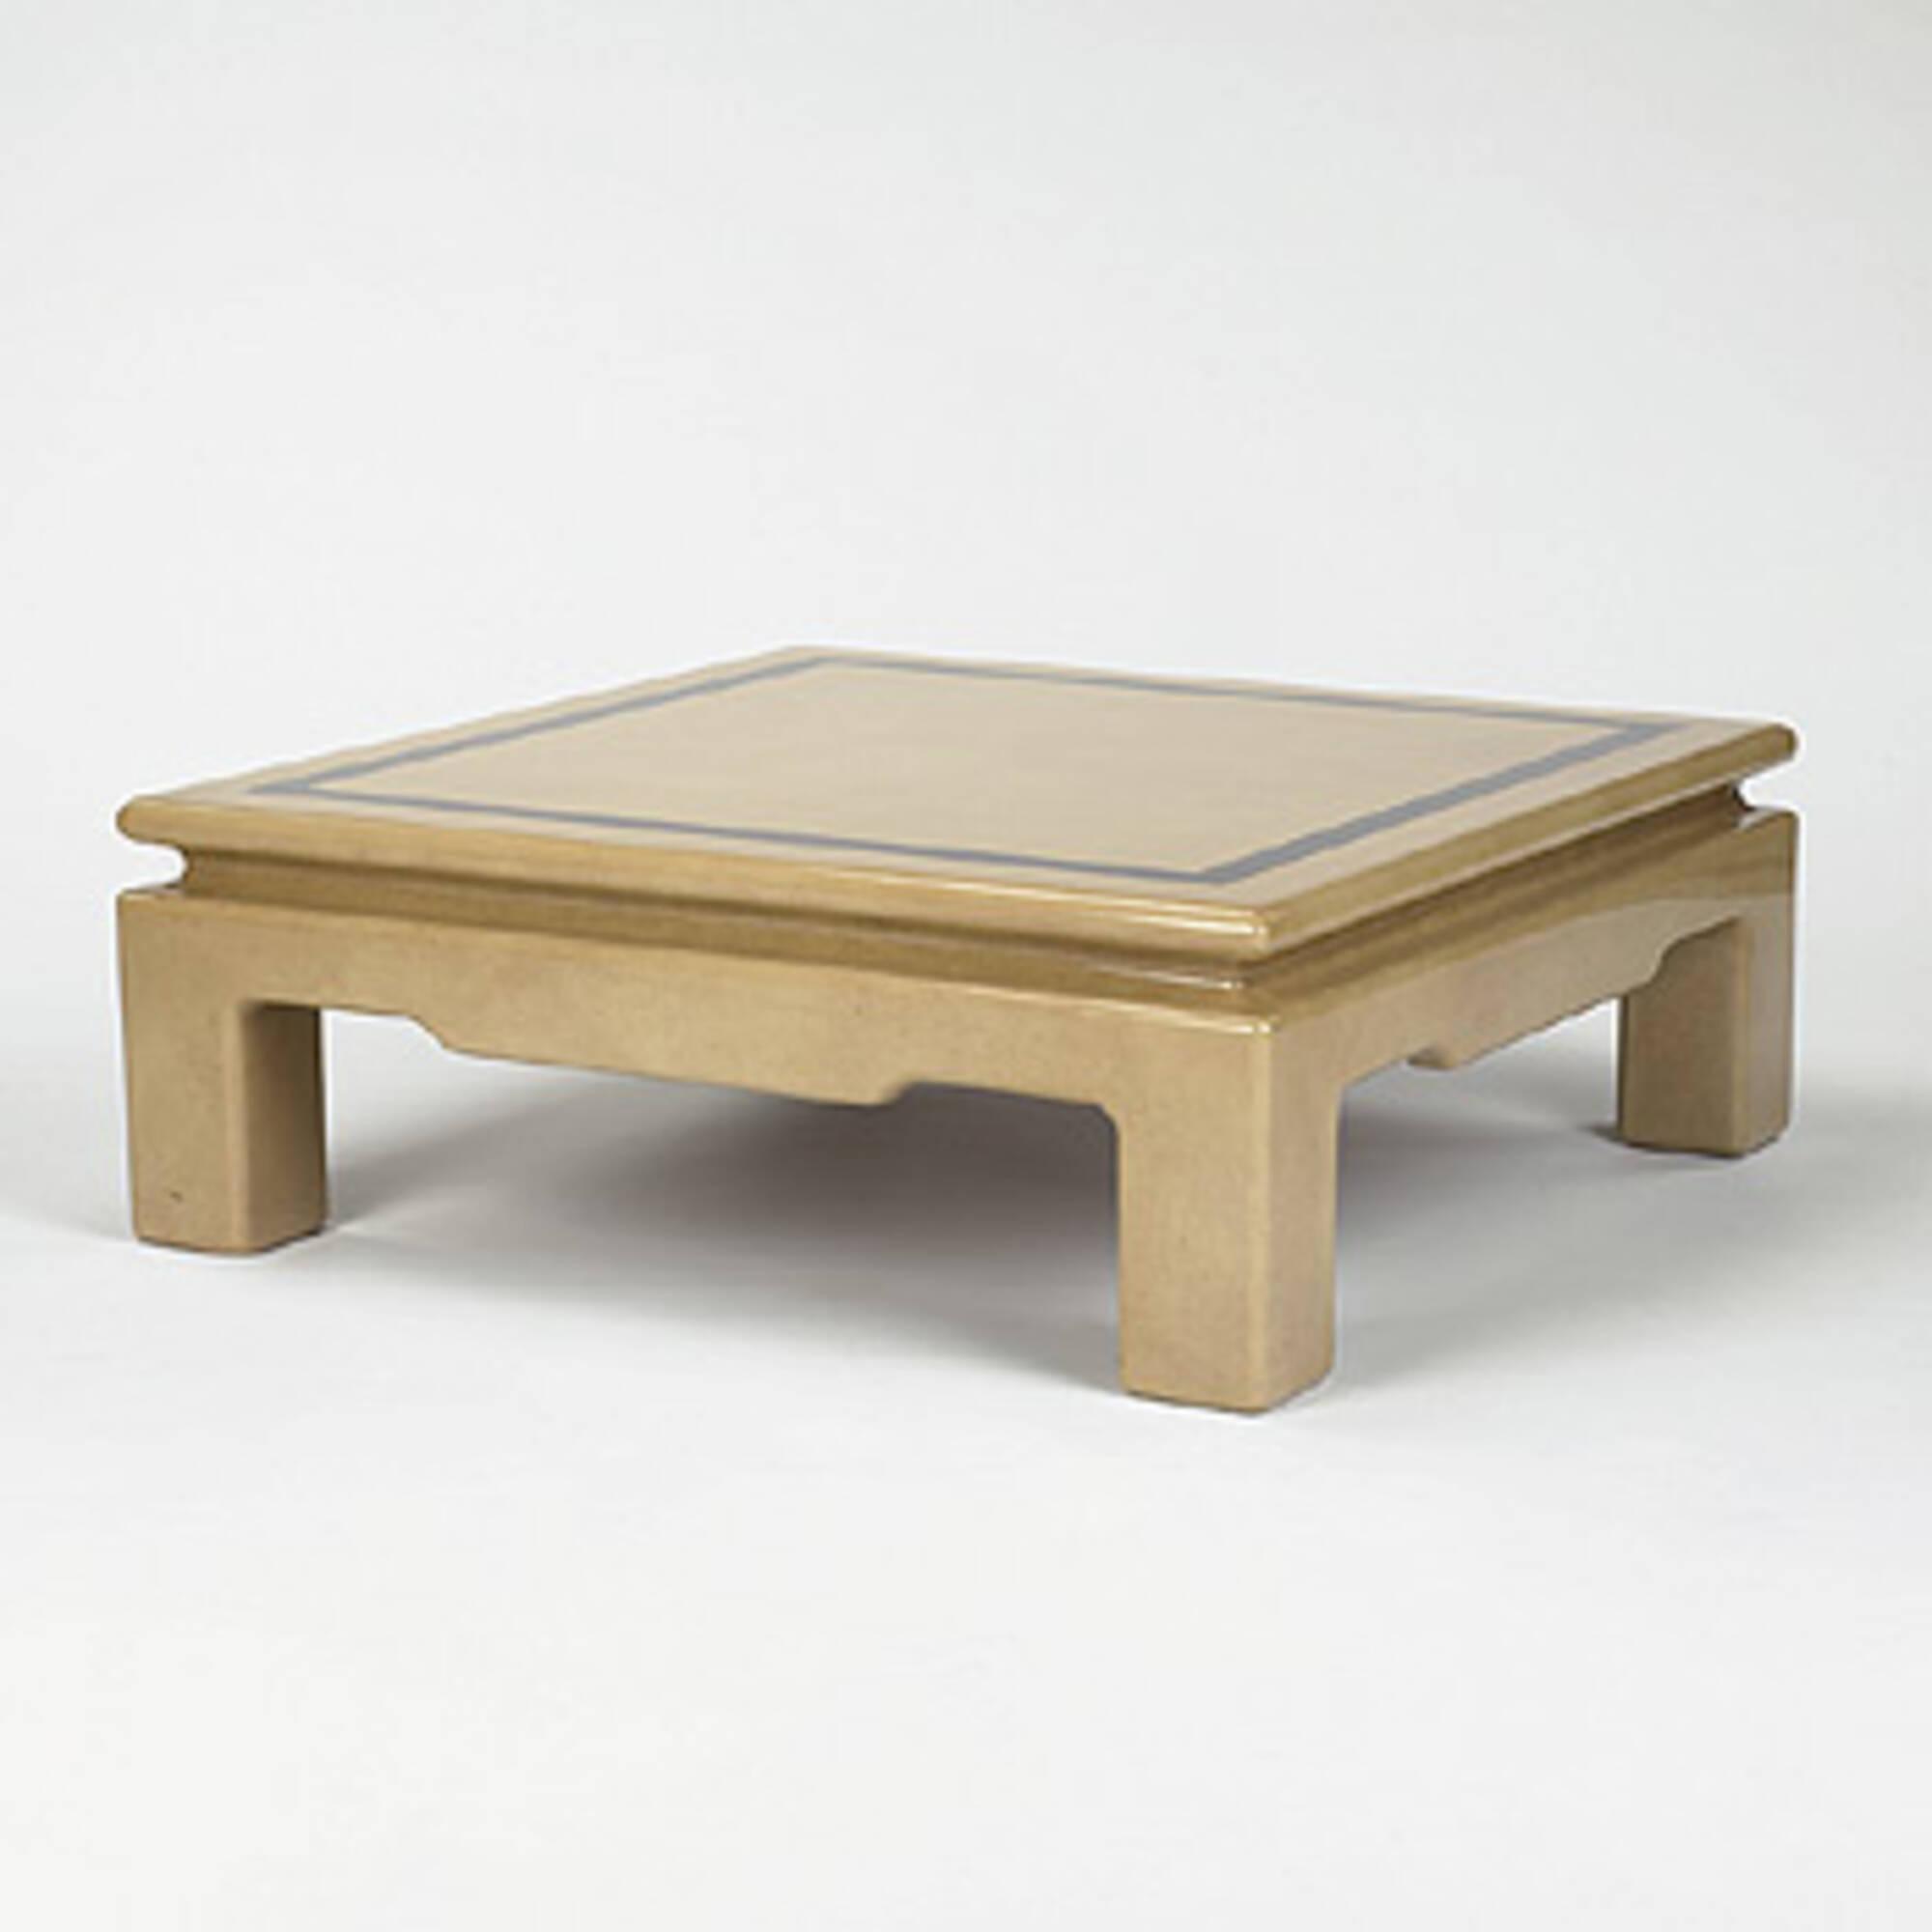 545: Karl Springer / Coffee Table (1 Of 1)